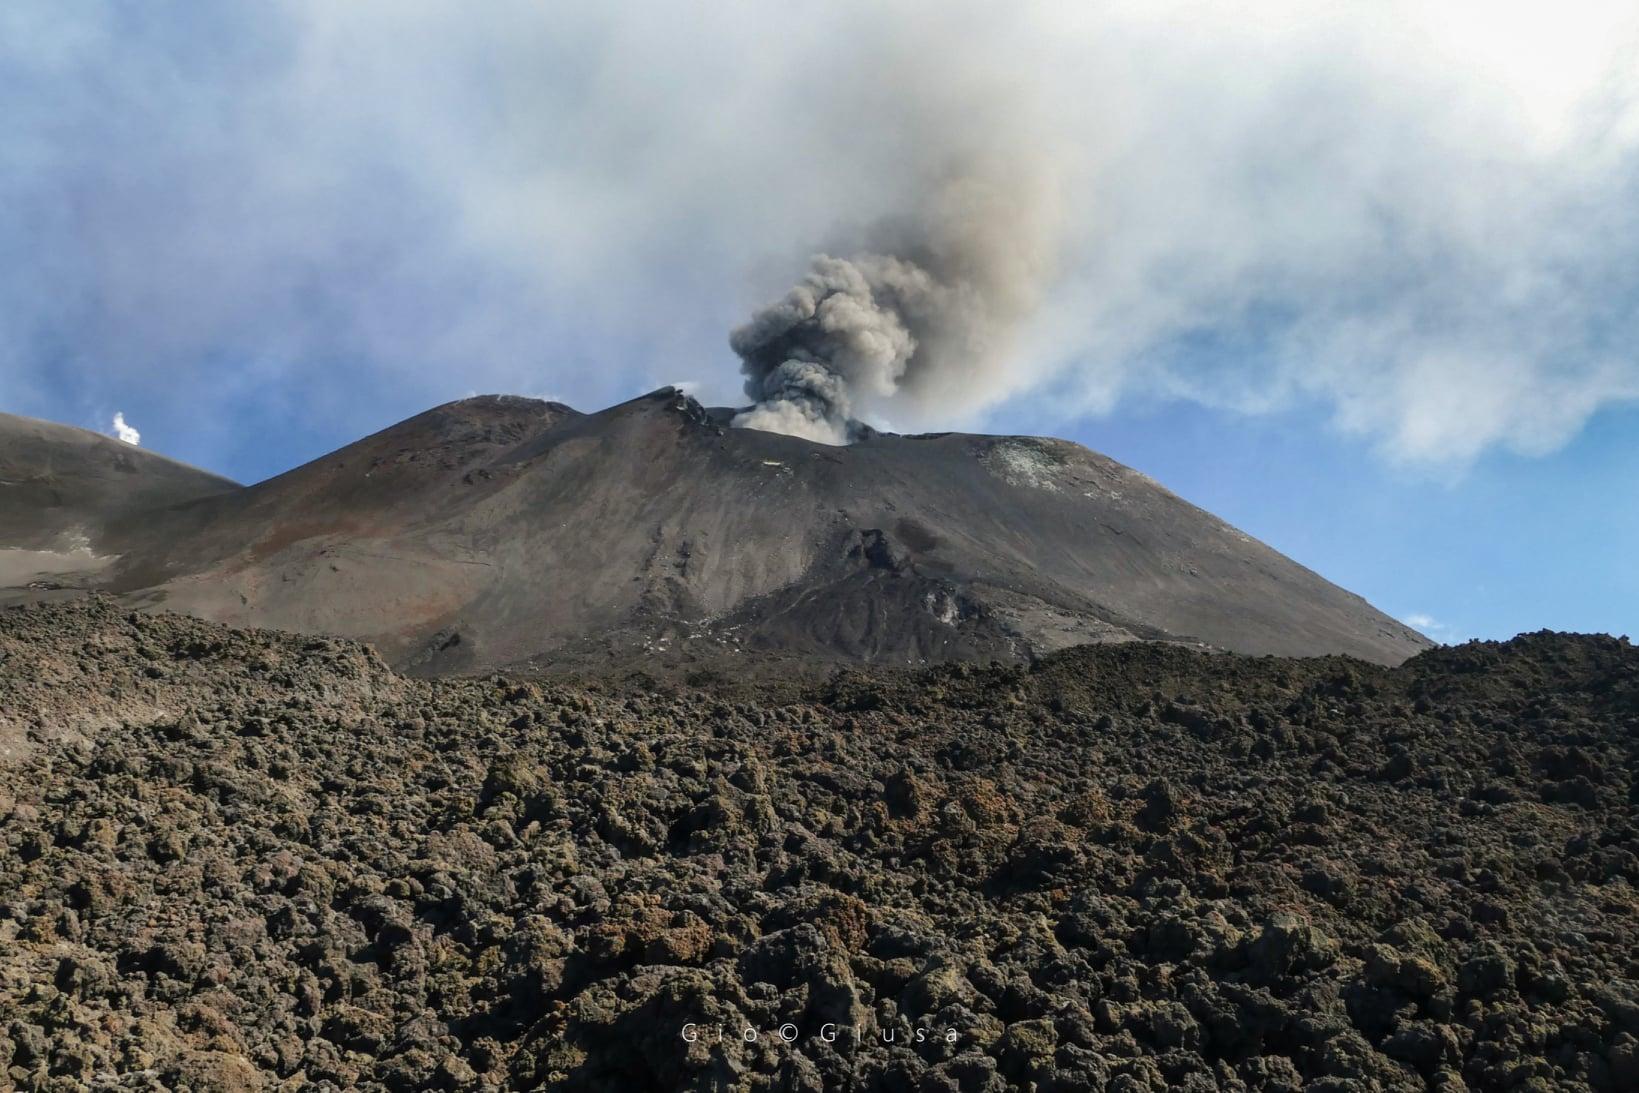 26 Aout 2020. FR . Italie / Sicile : Etna , Italie : Stromboli , Islande : Péninsule de Reykjanes , Colombie : Nevado del Ruiz .